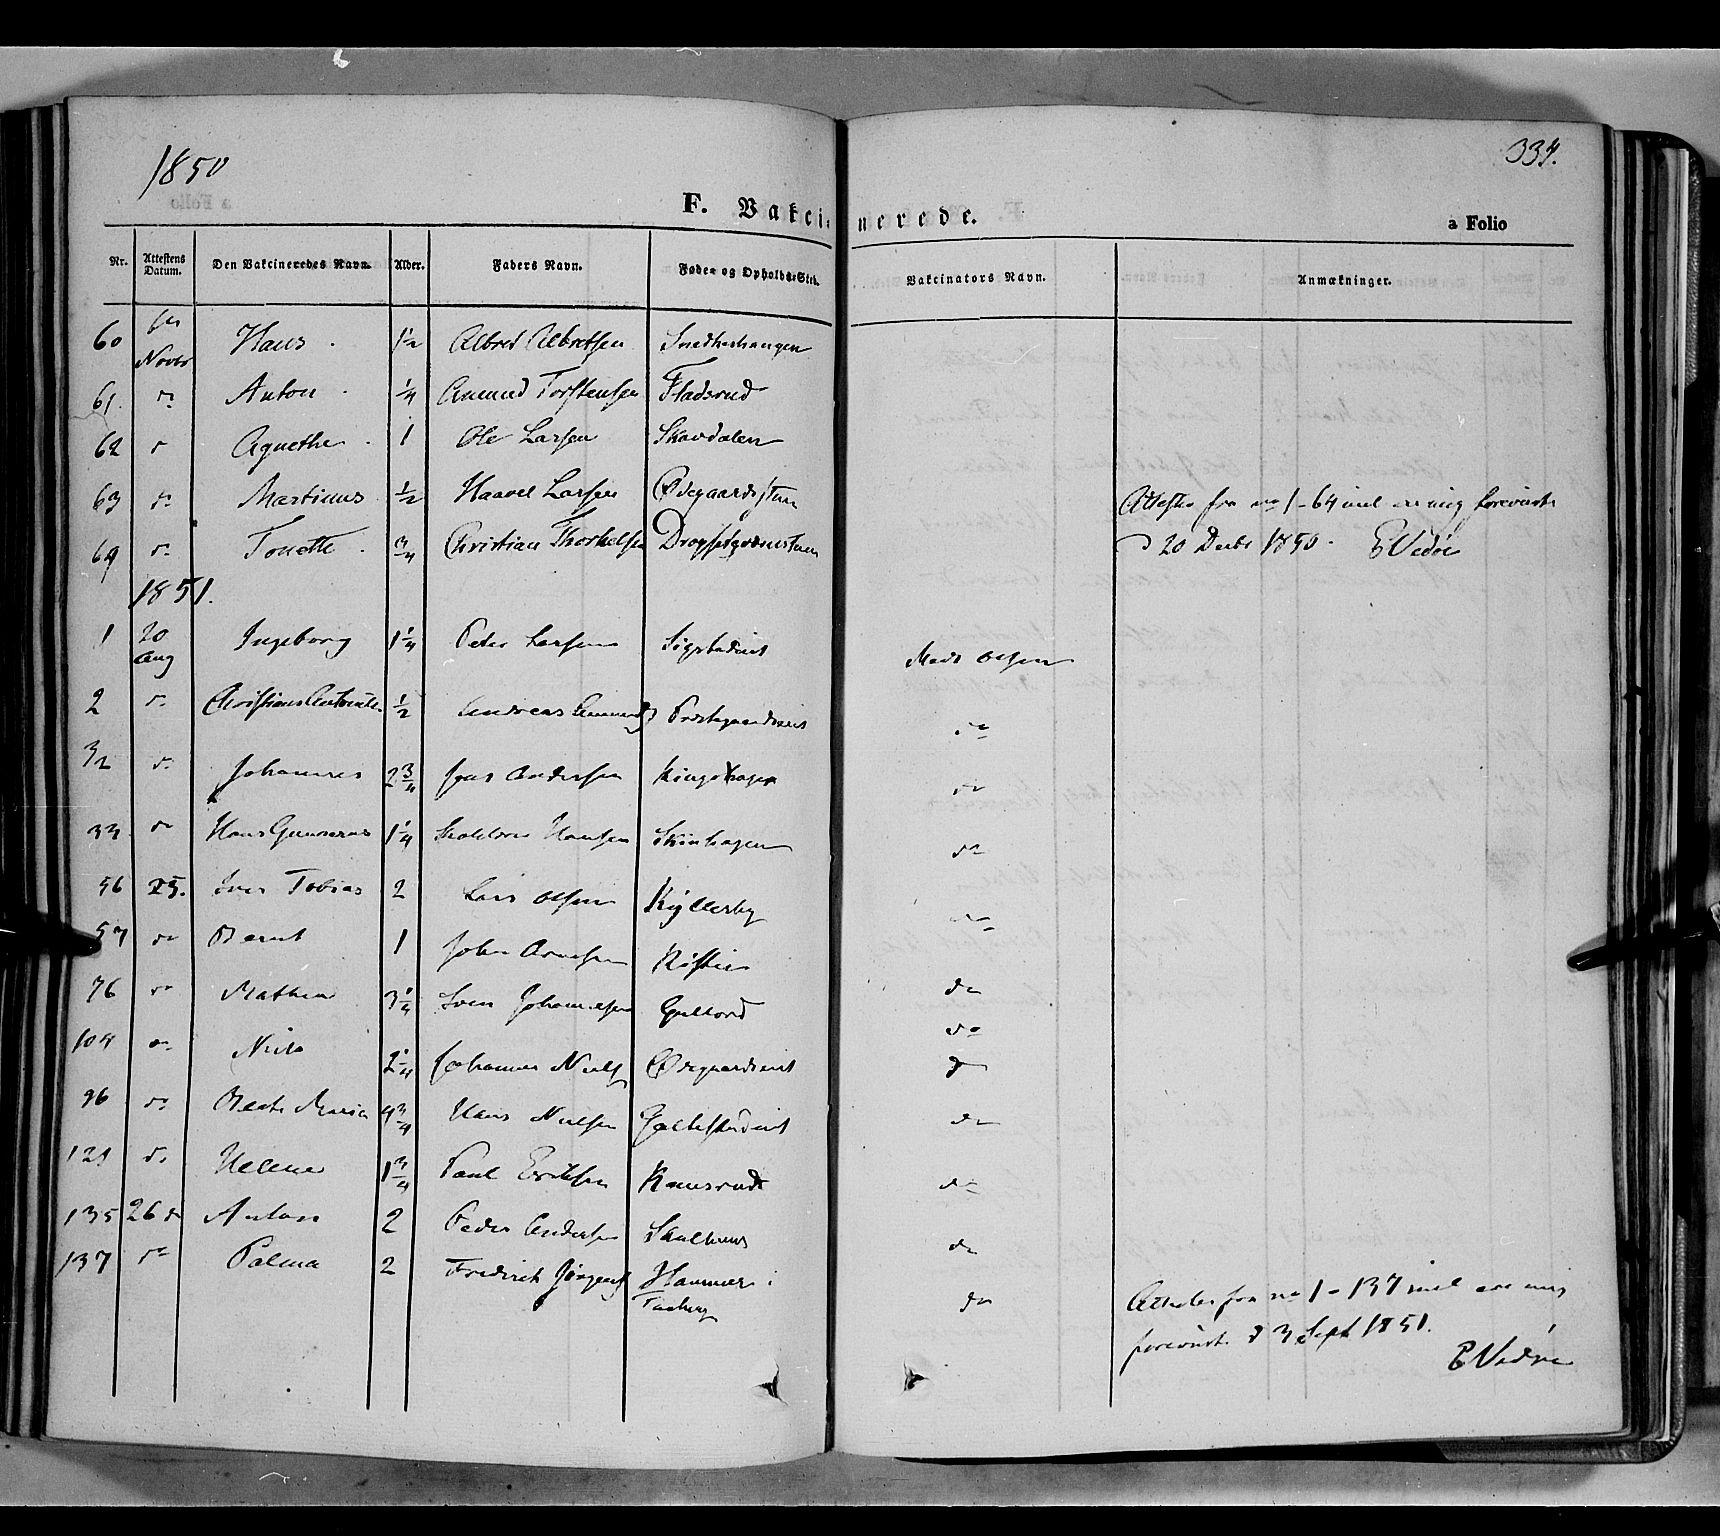 SAH, Biri prestekontor, Ministerialbok nr. 5, 1843-1854, s. 334